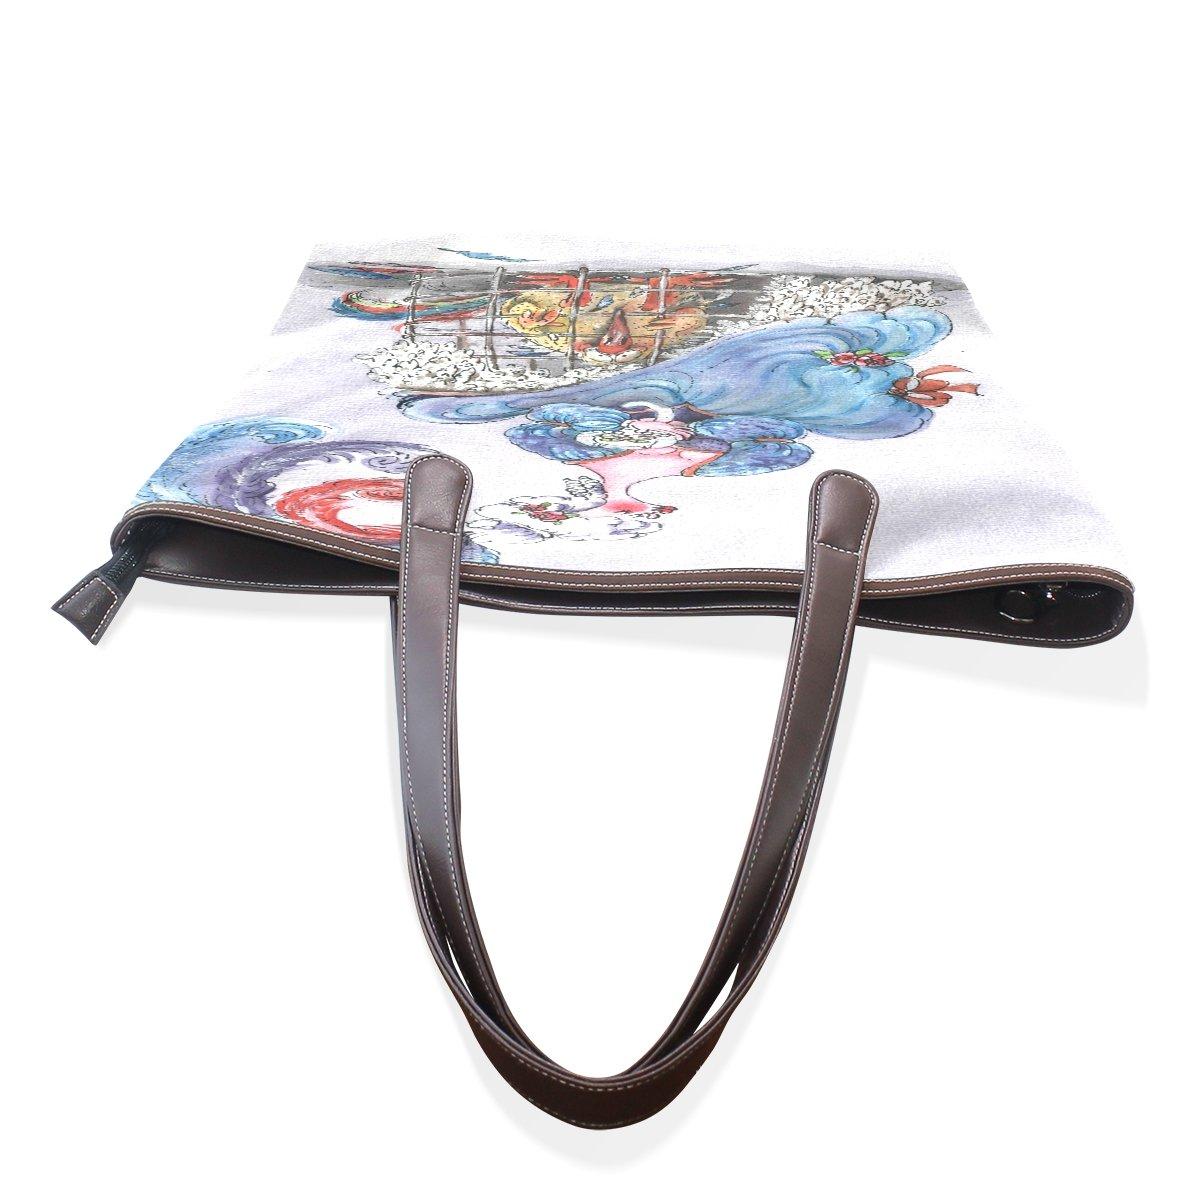 Ye Store Art Of Coloured Drawing Or Pattern Lady PU Leather Handbag Tote Bag Shoulder Bag Shopping Bag